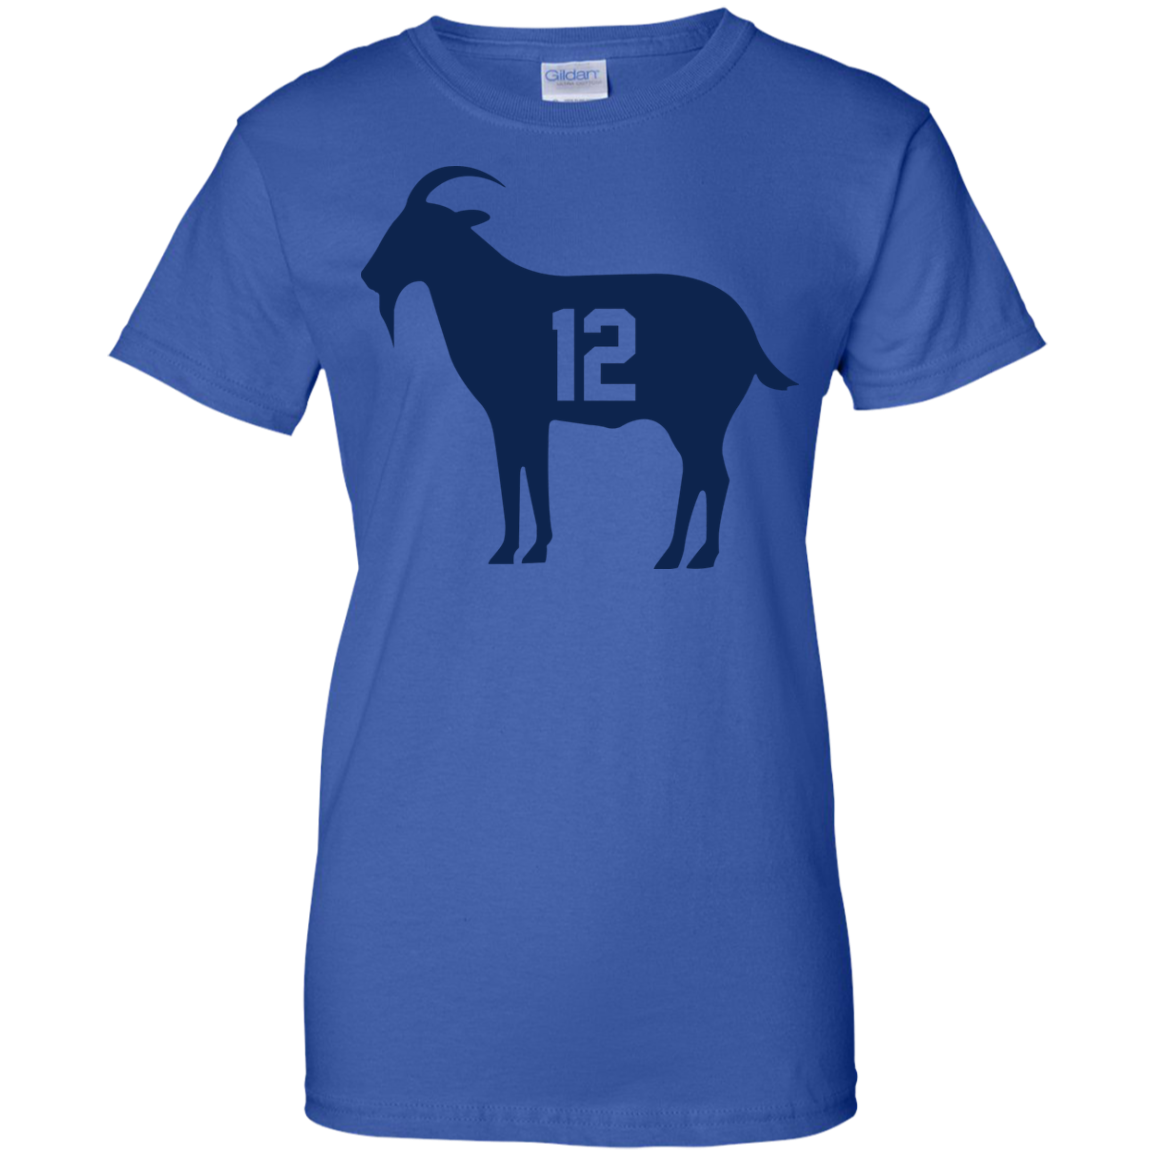 image 84px Goat Tb 12 Tom Brady T Shirt, Hoodies, Tank Top